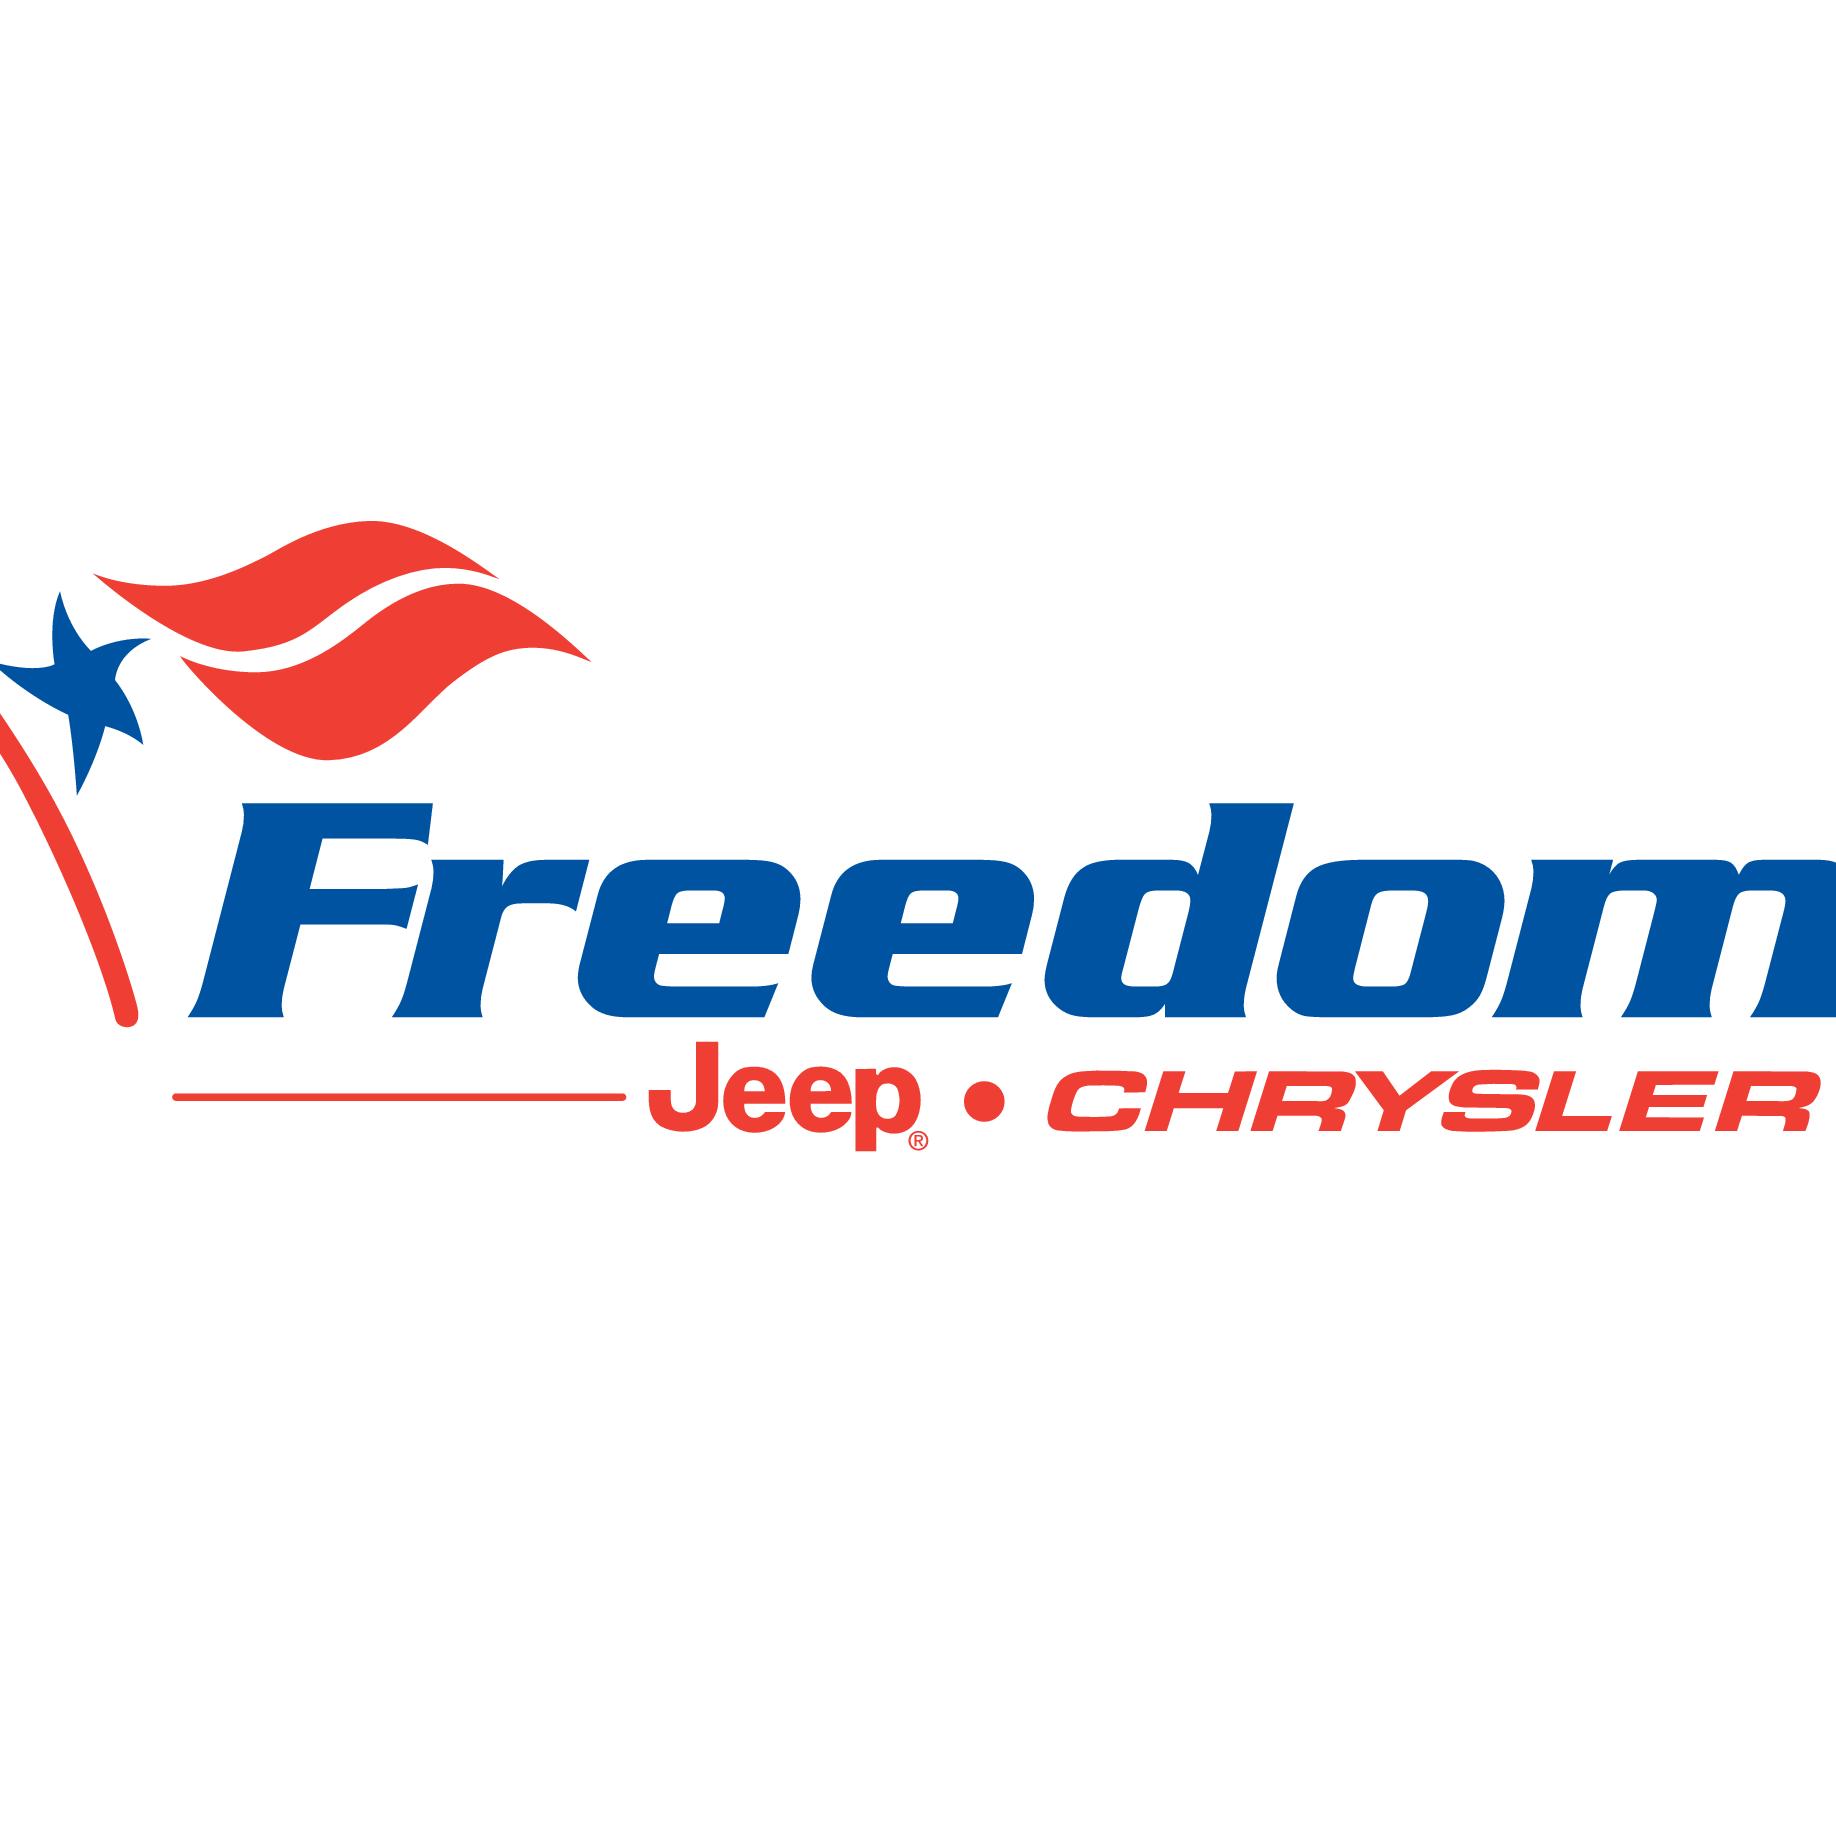 Freedom Jeep Chrysler